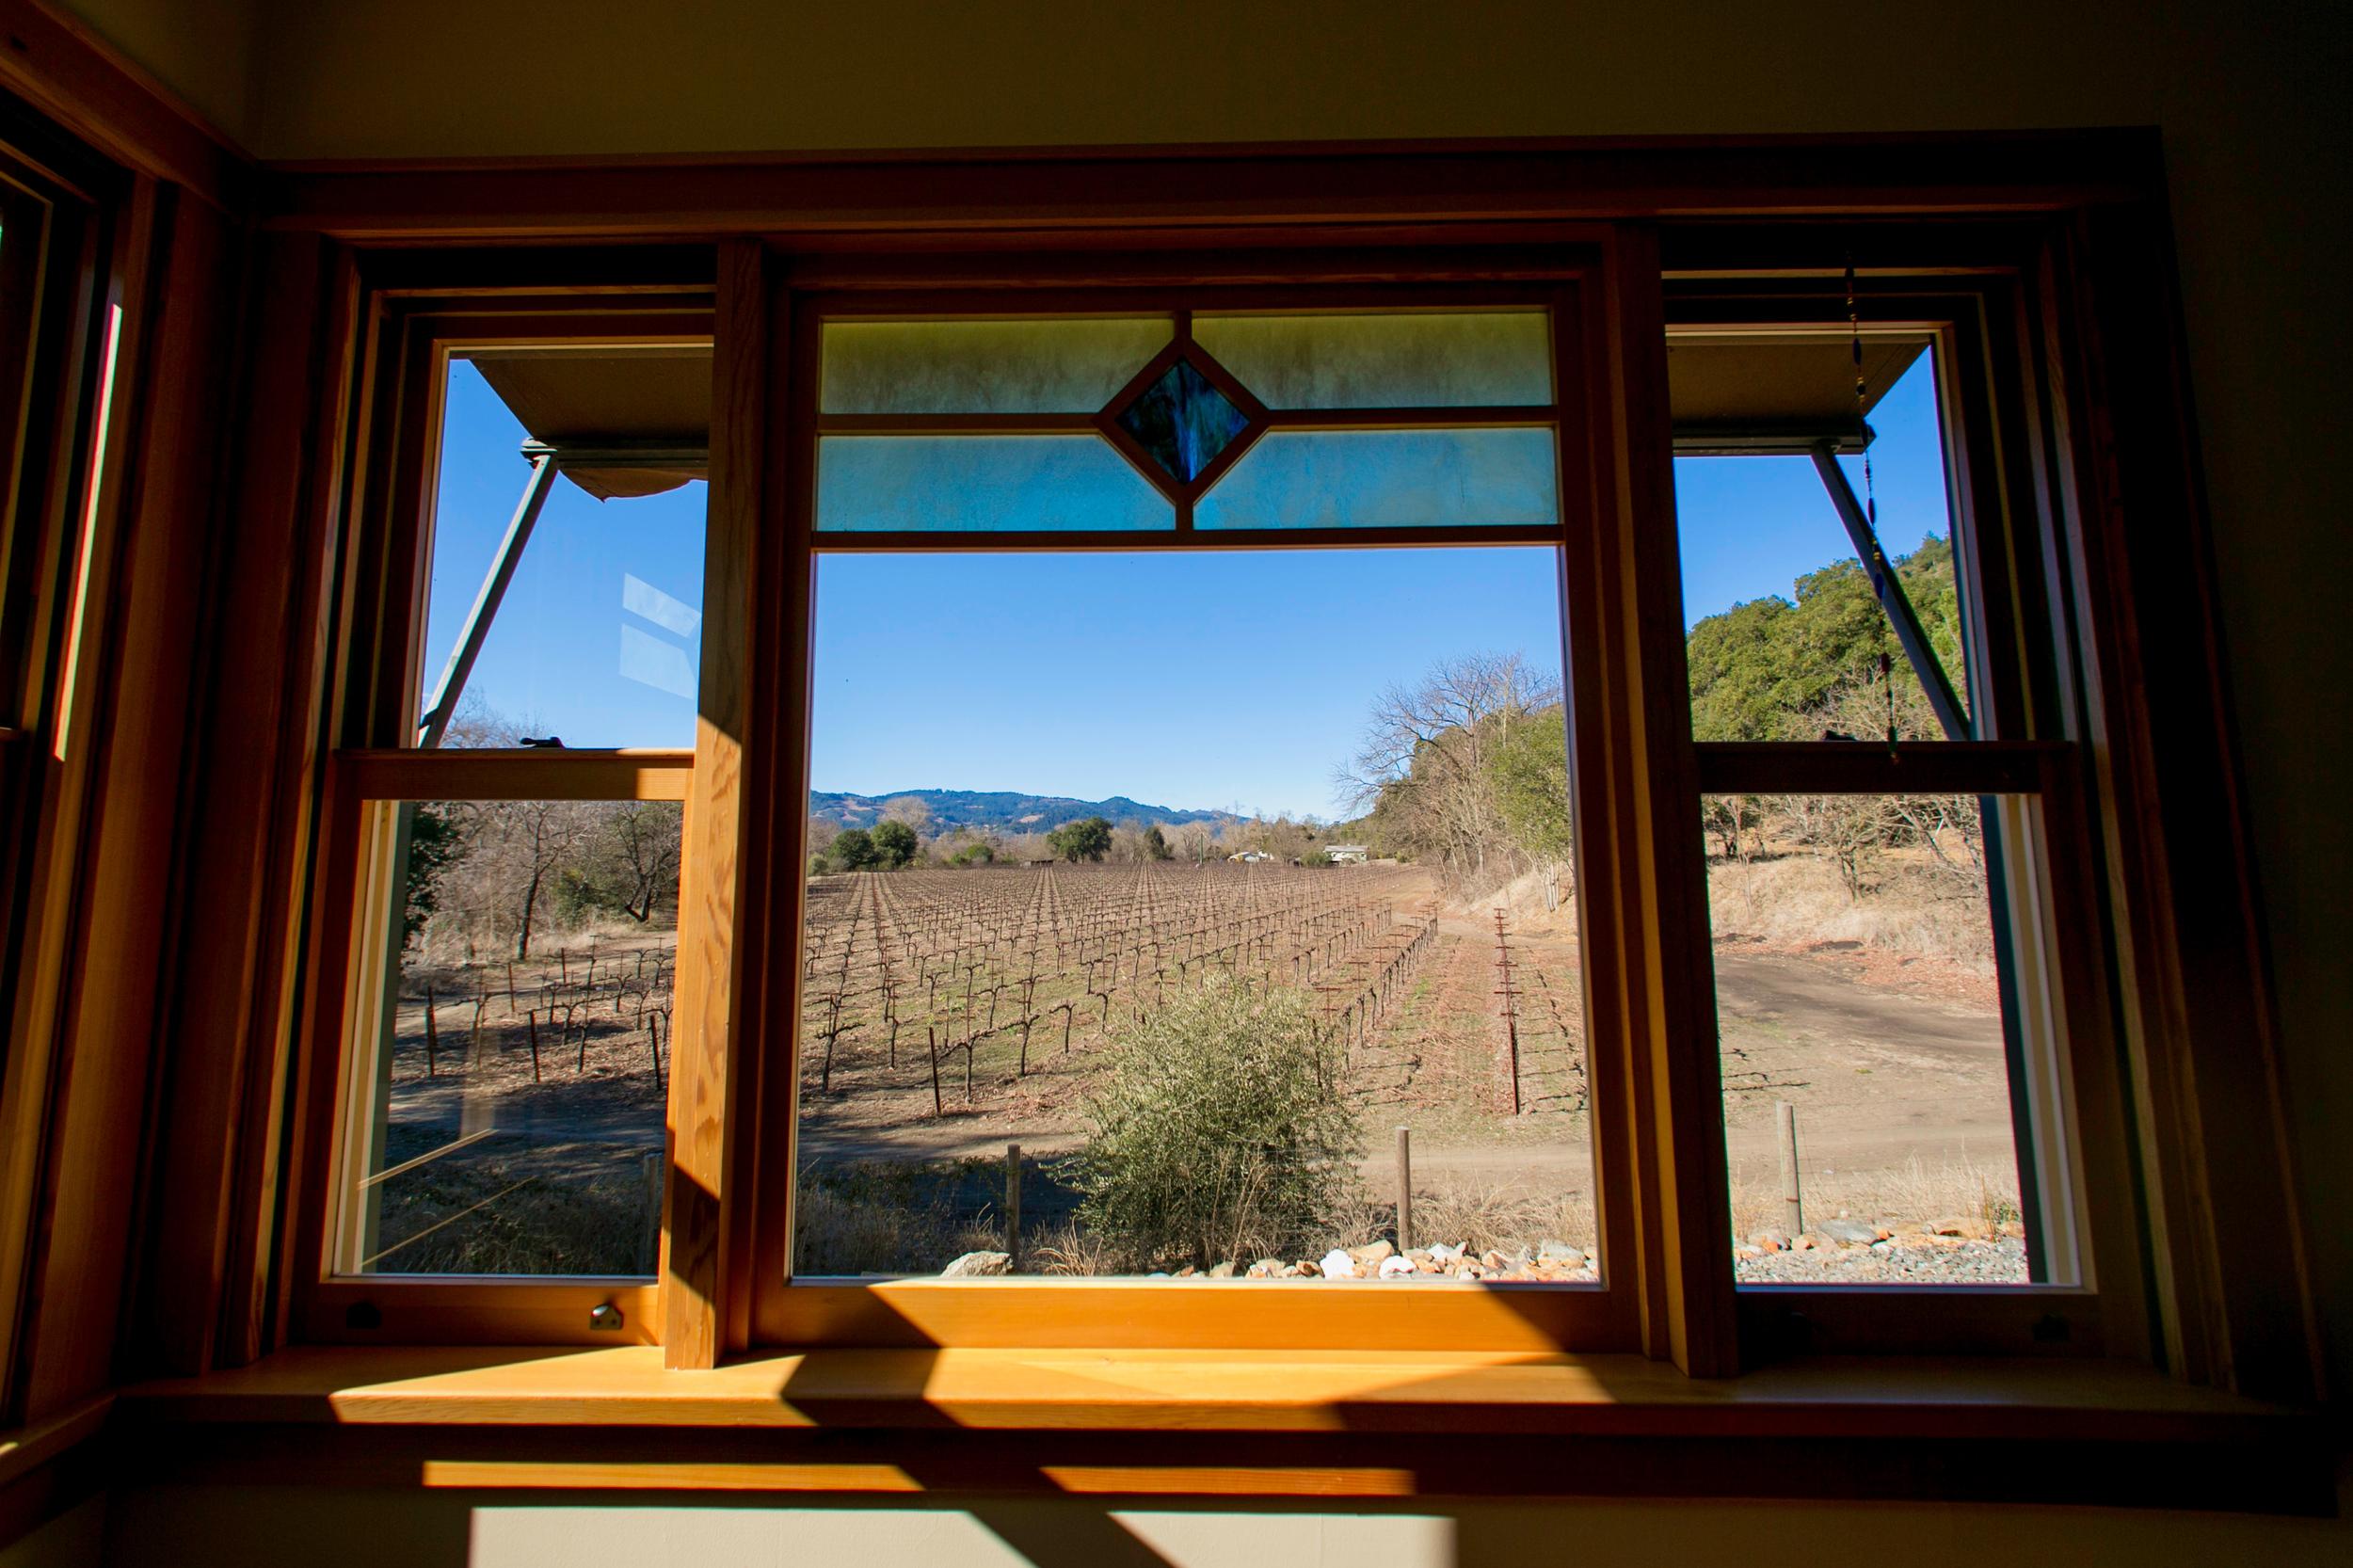 Vineyards and vineyards and vineyard for miles